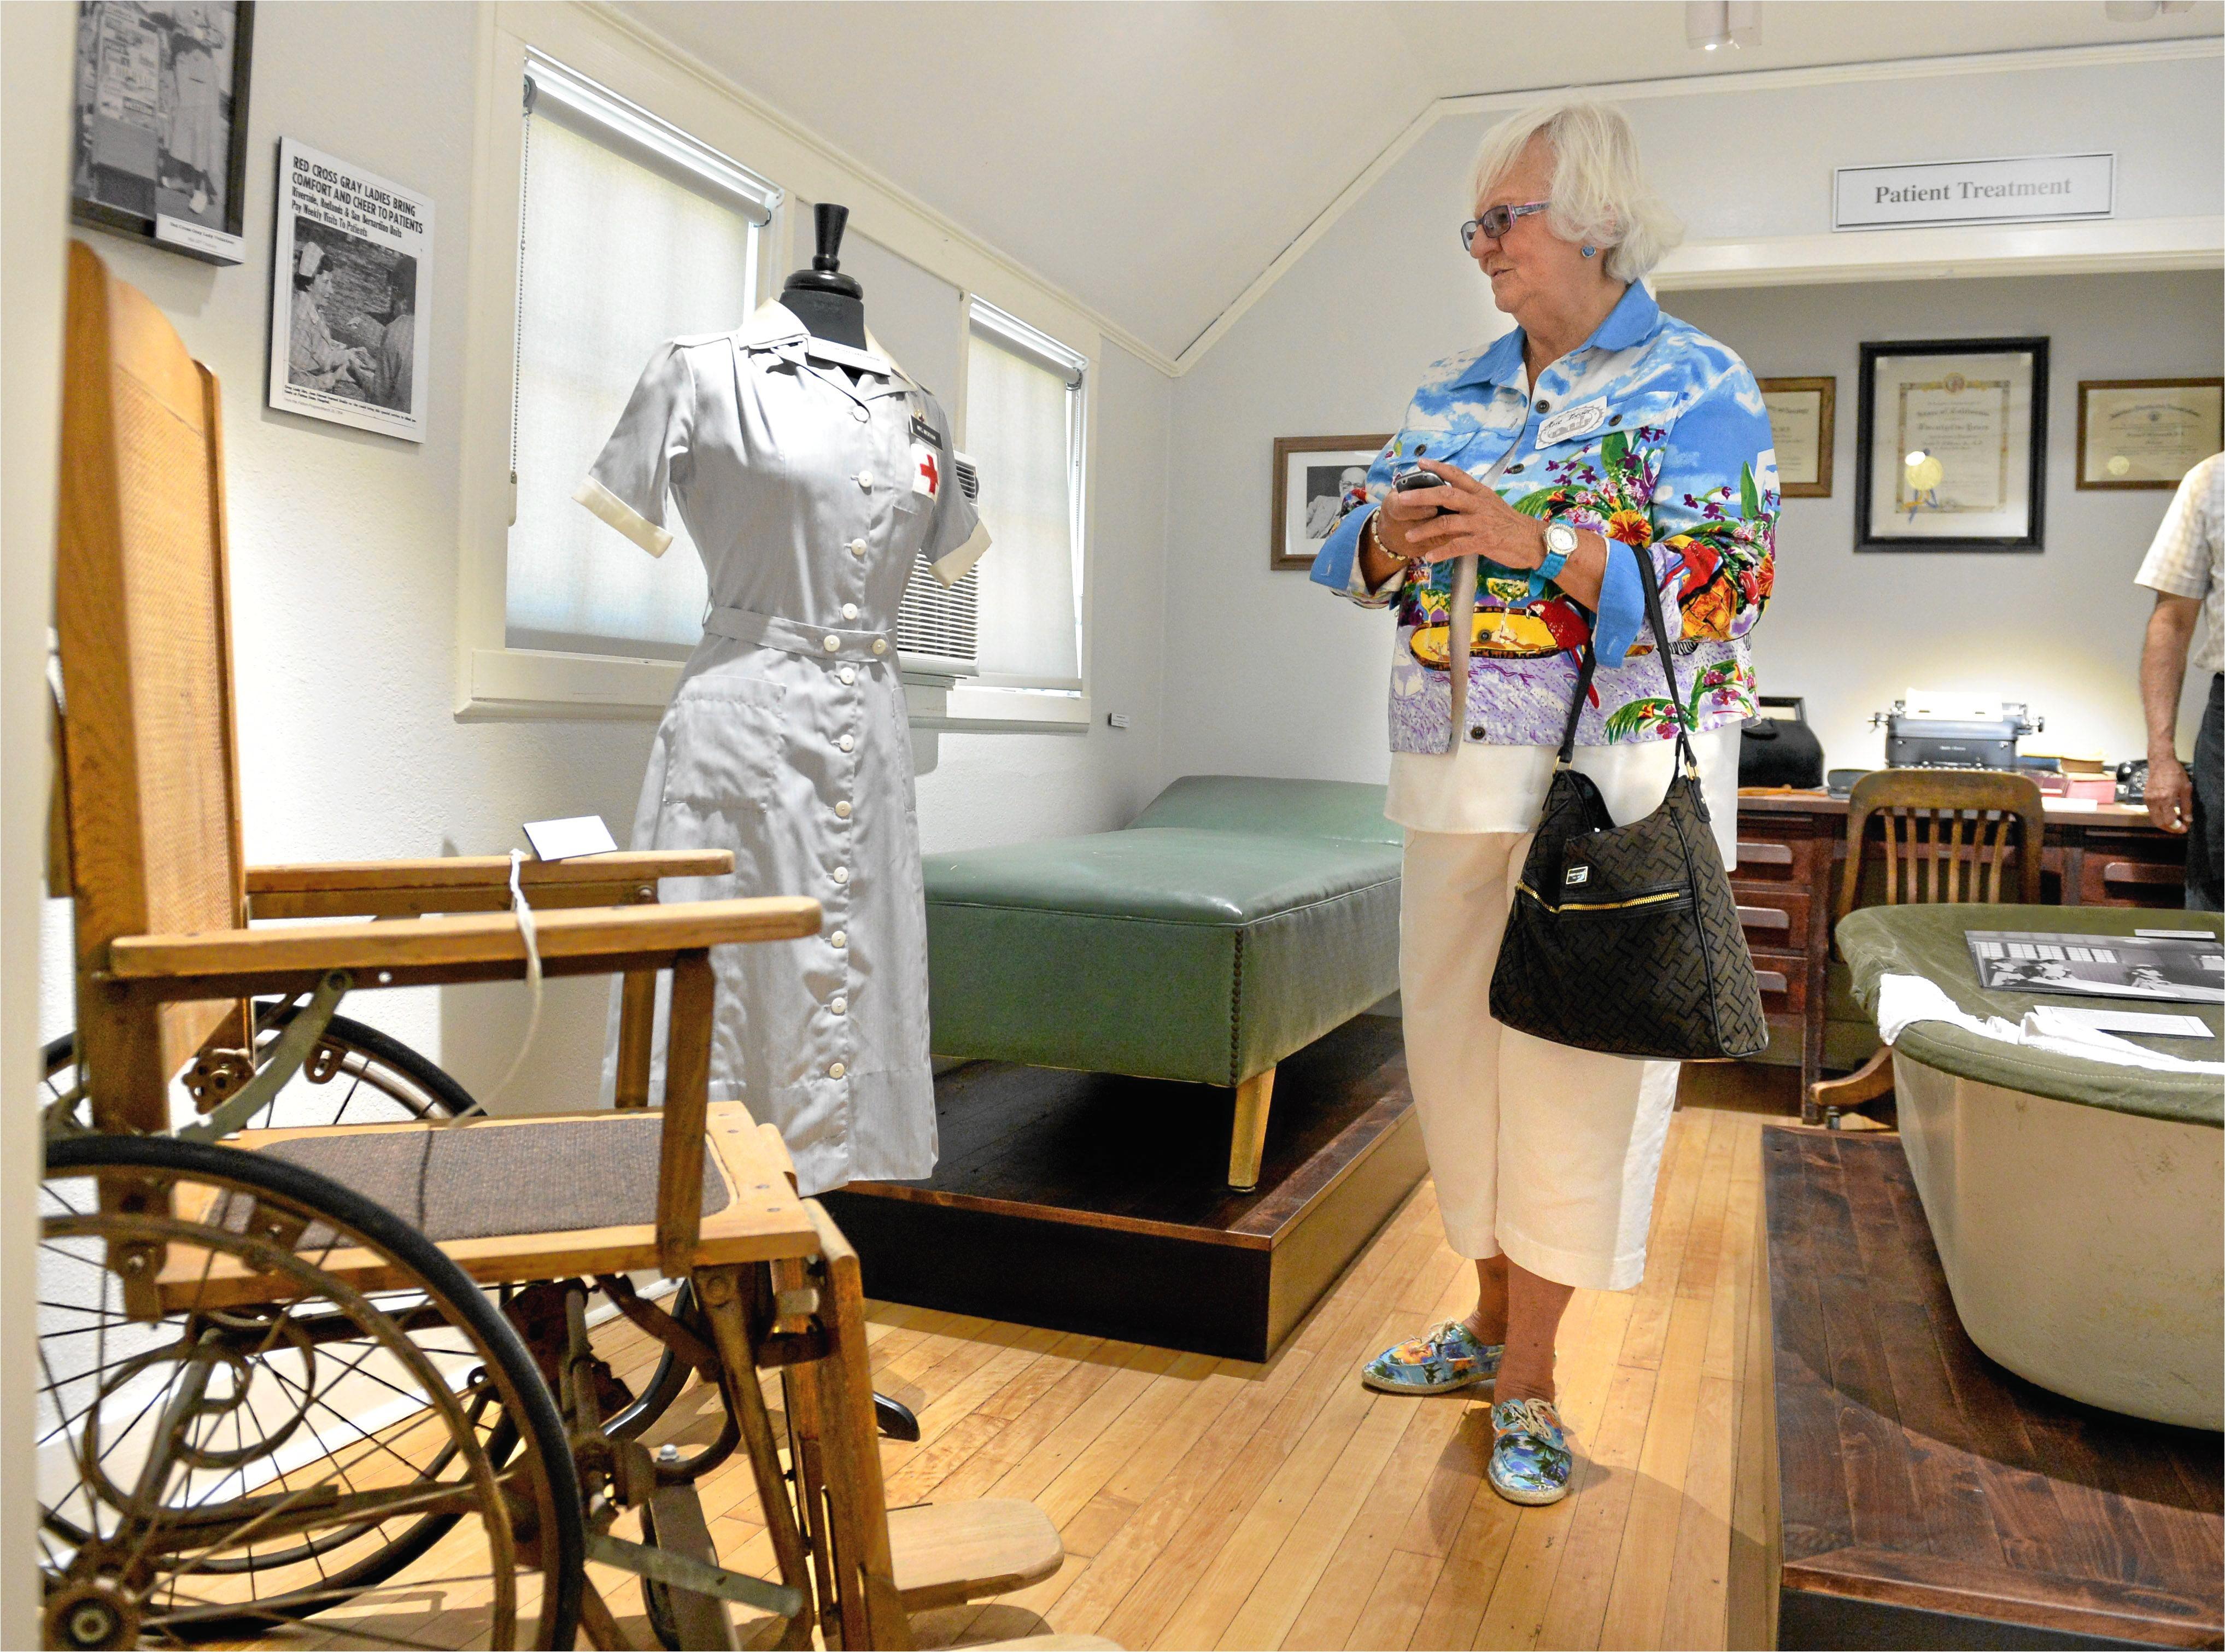 patton state hospital museum explores psychiatry both good and bad san bernardino sun